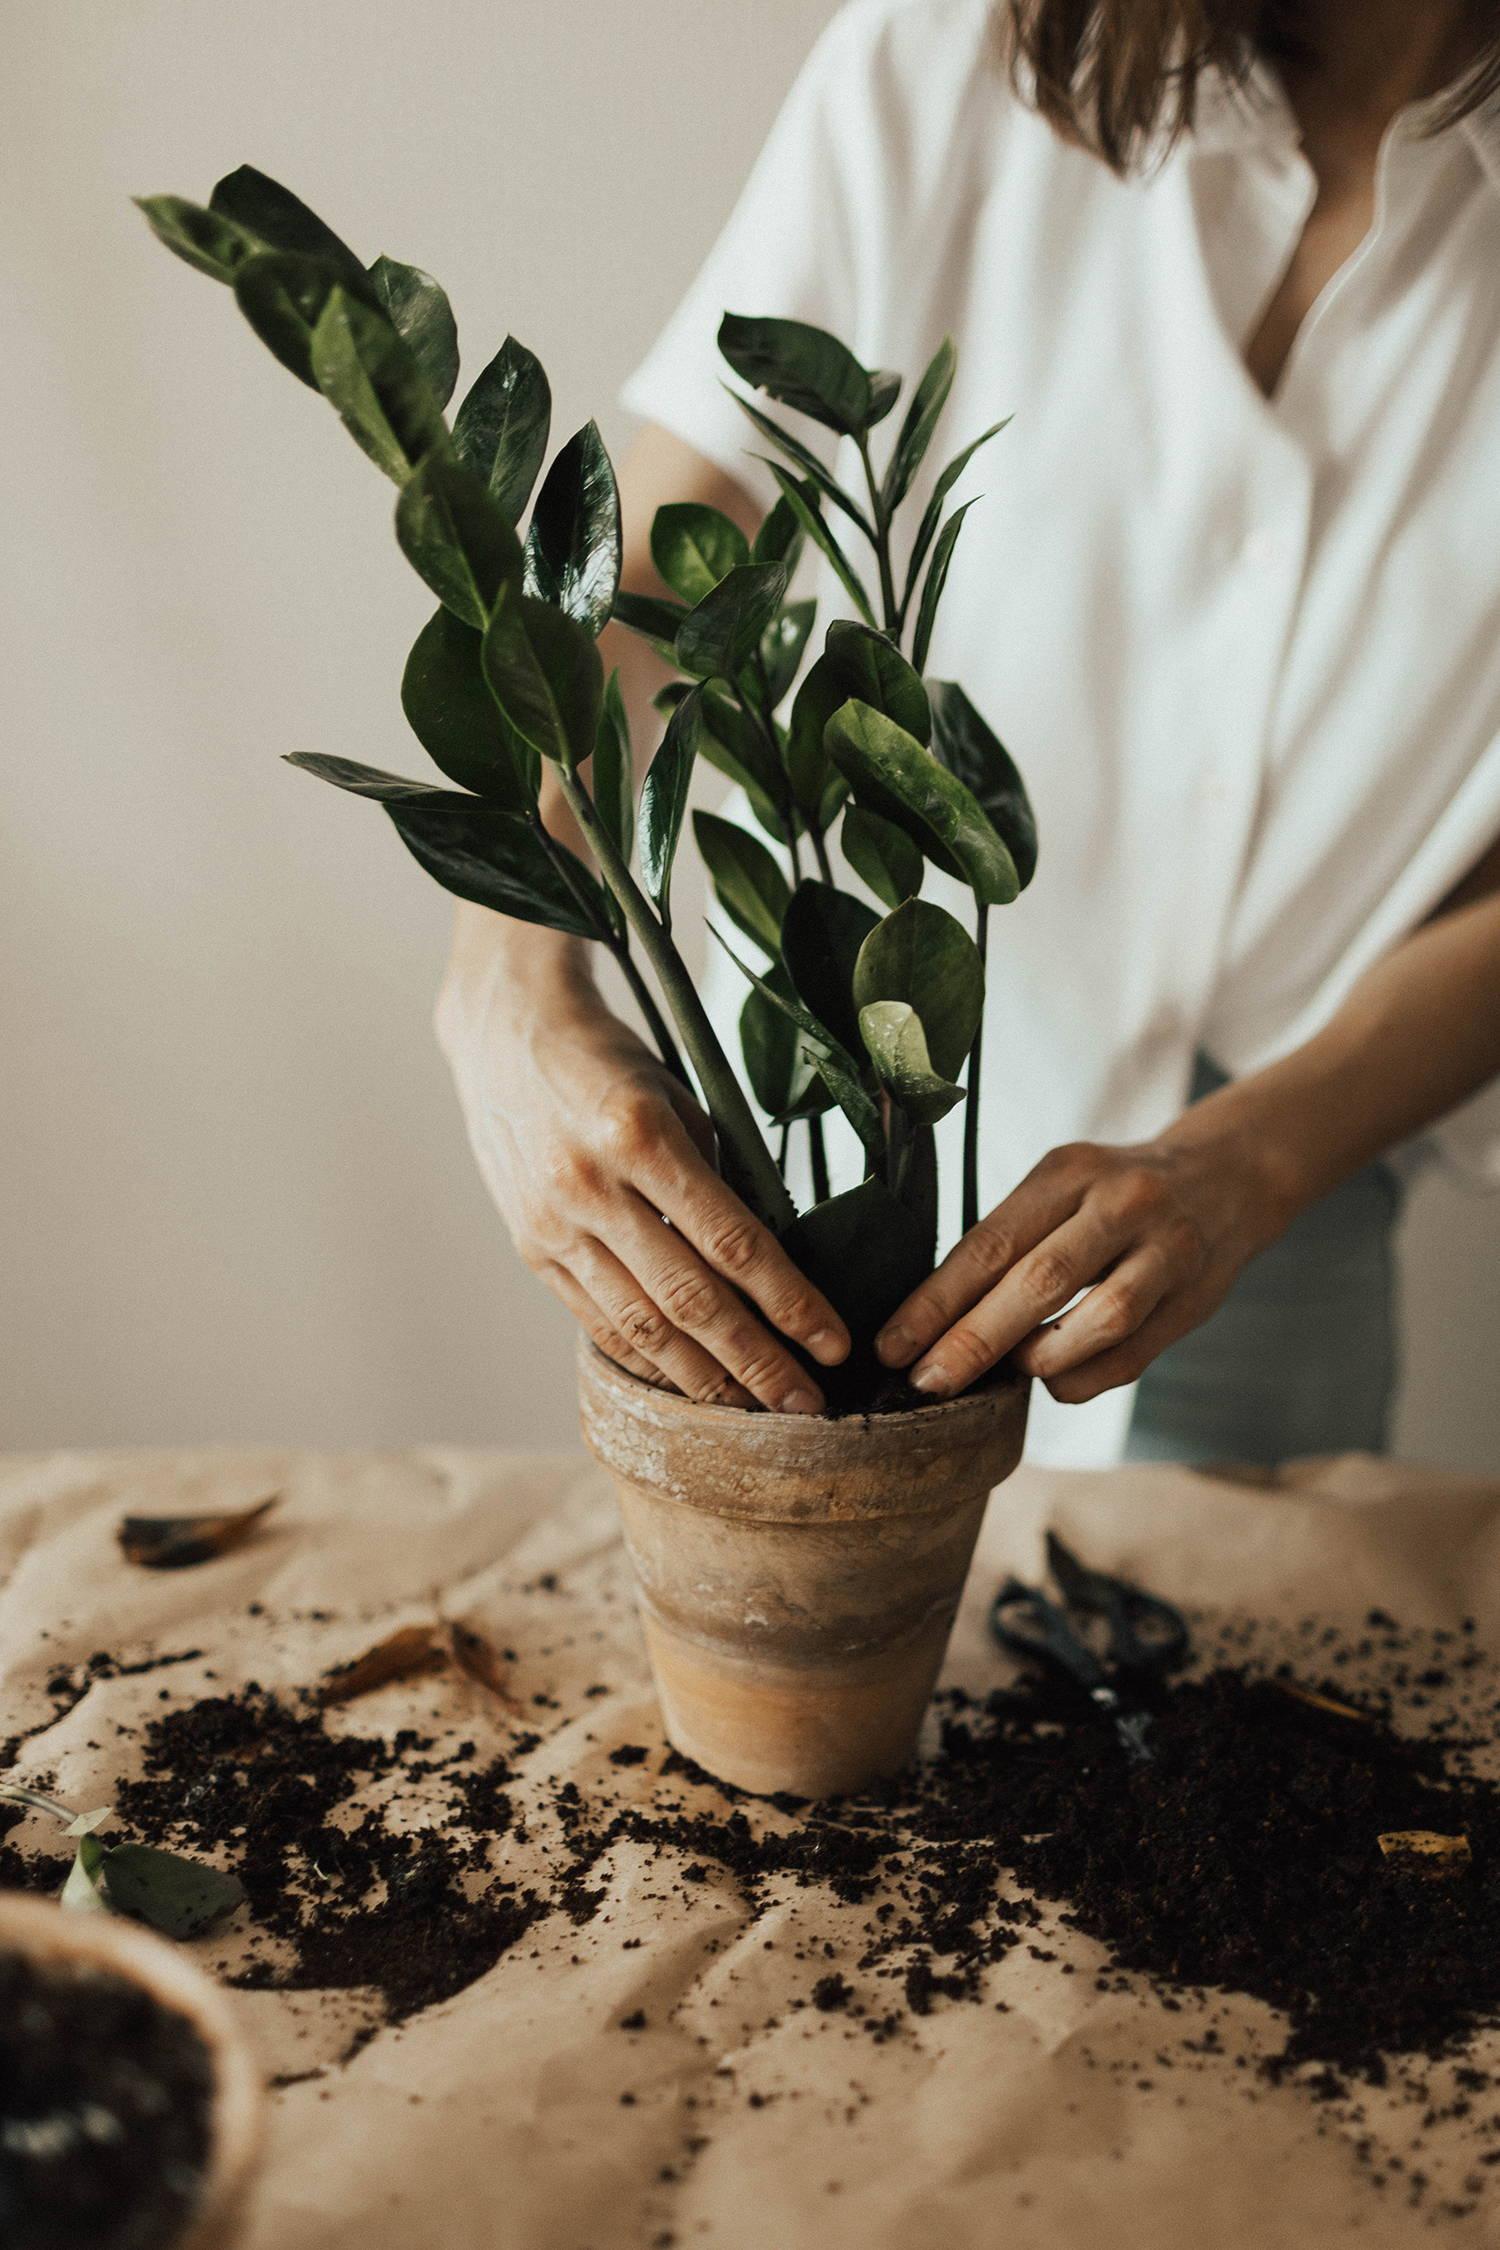 A botany expert repotting a new ZZ houseplant.